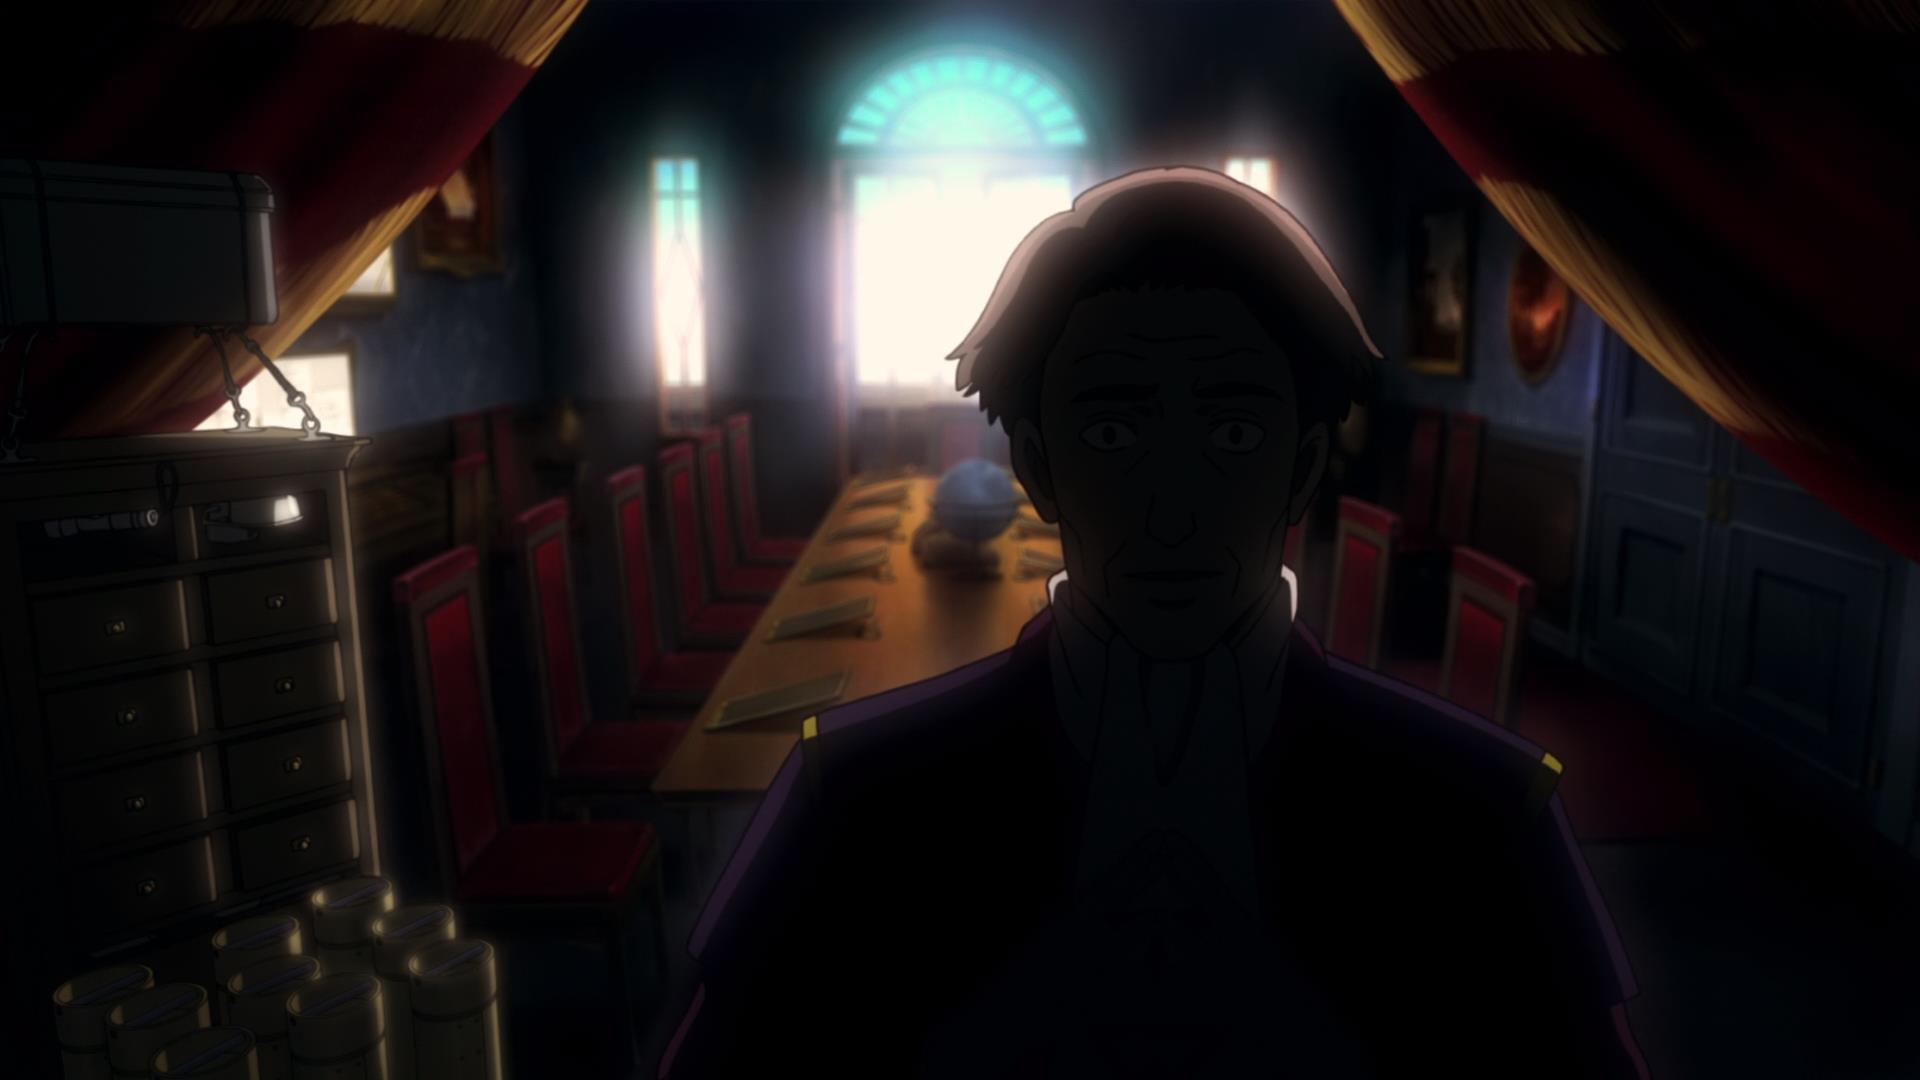 sakasama no patema full movie english sub